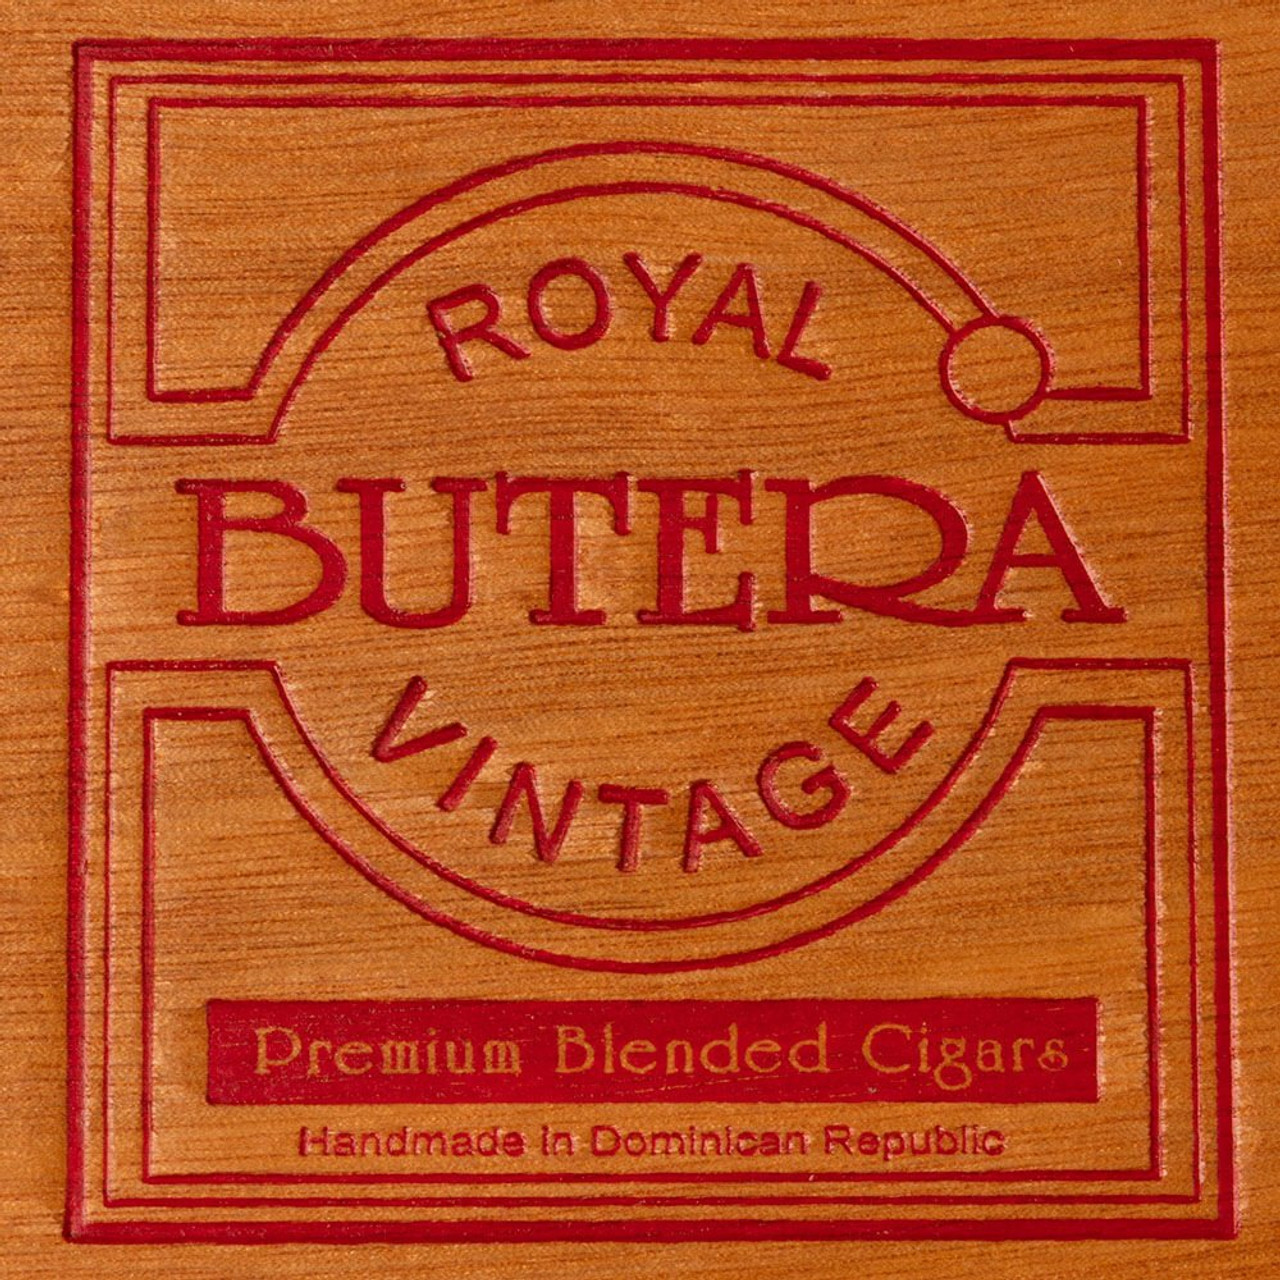 Butera Royal Vintage Logo